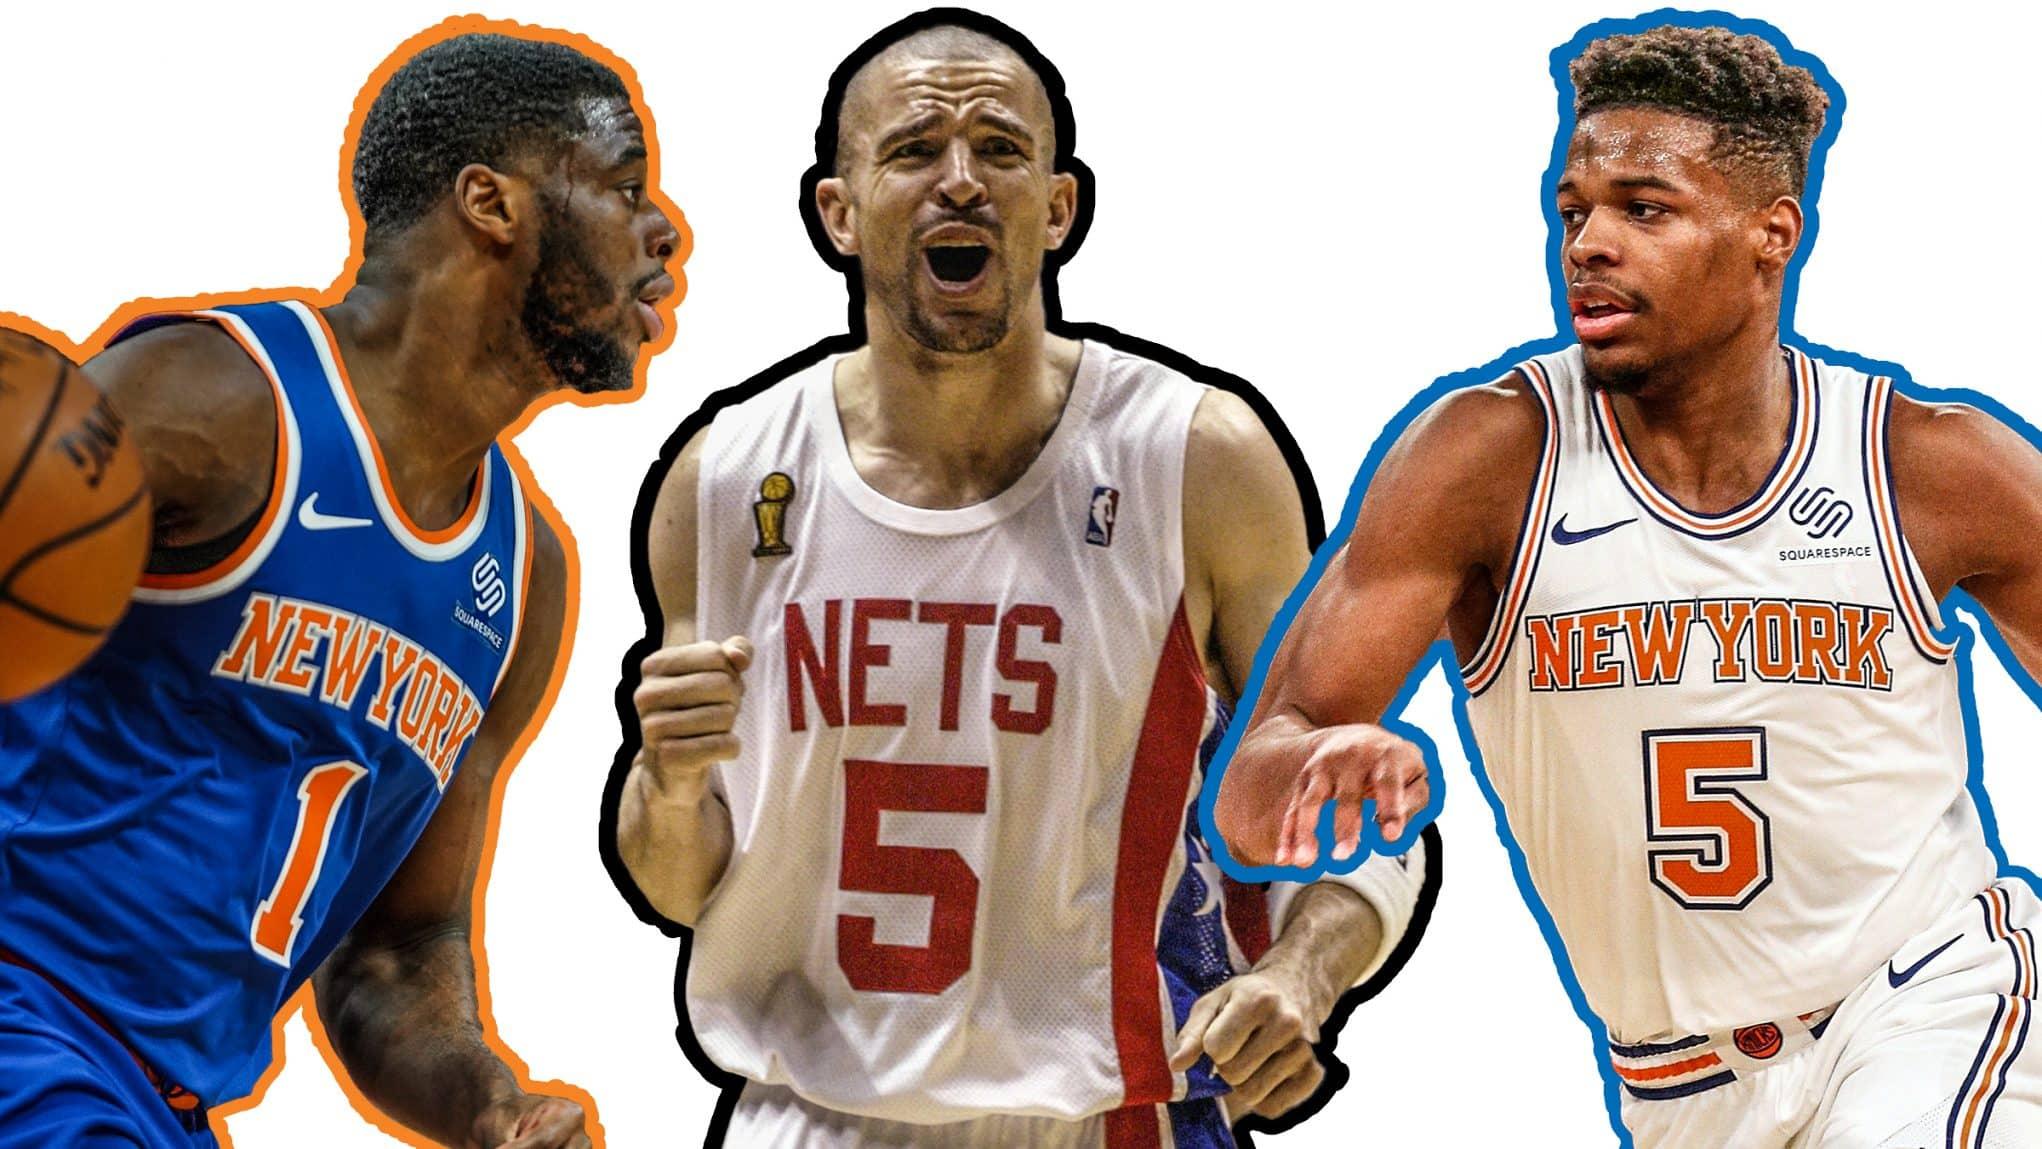 085304937 New York Knicks  Dennis Smith Jr.